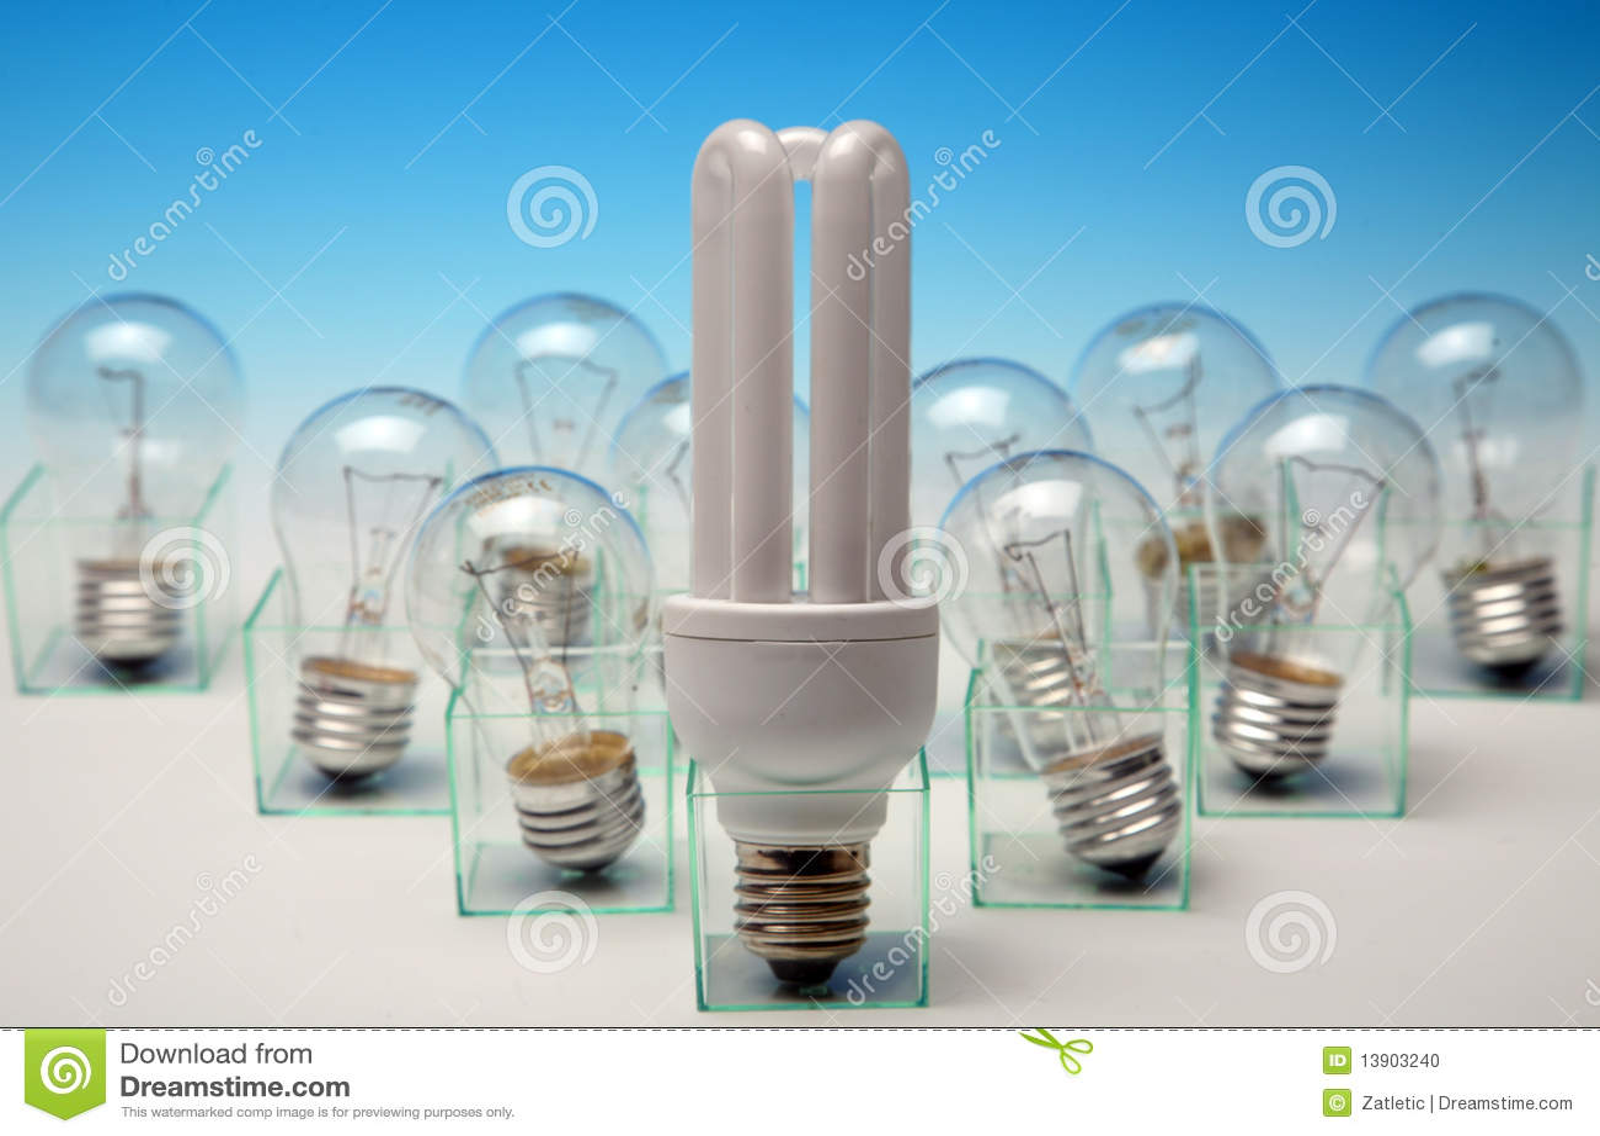 Light Bulbs Stock Photo Image 13903240